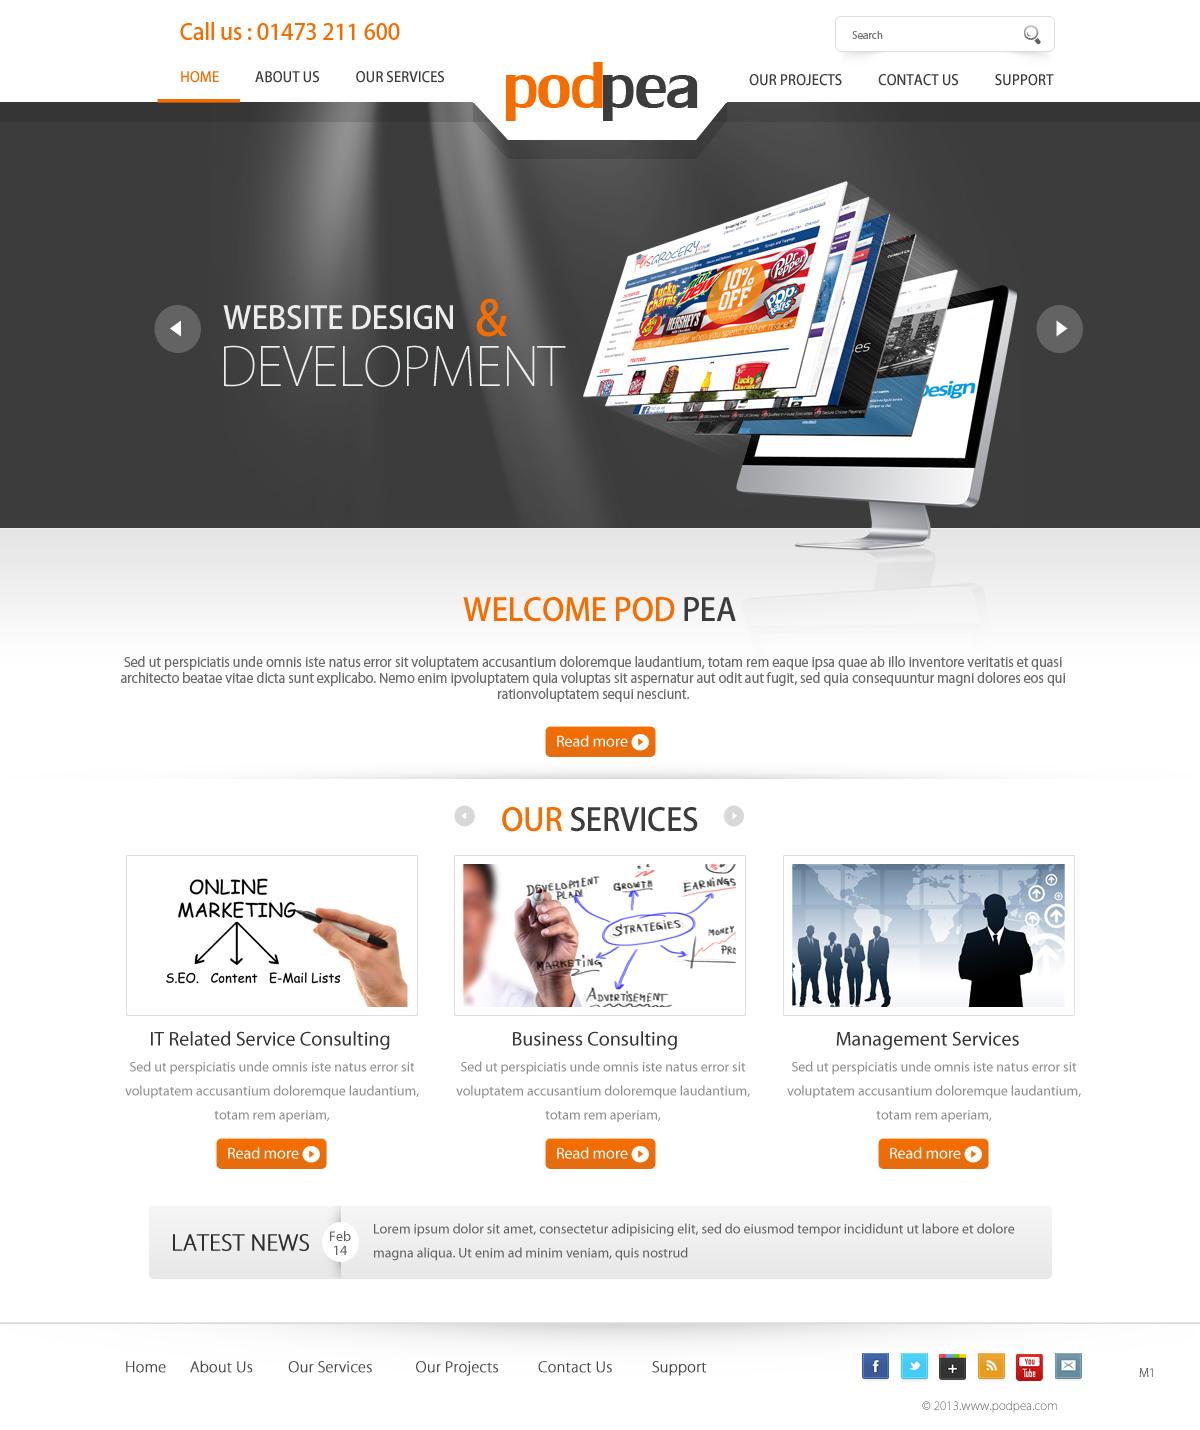 Modern Upmarket Software Web Design For A Company By Pb Design 1707159